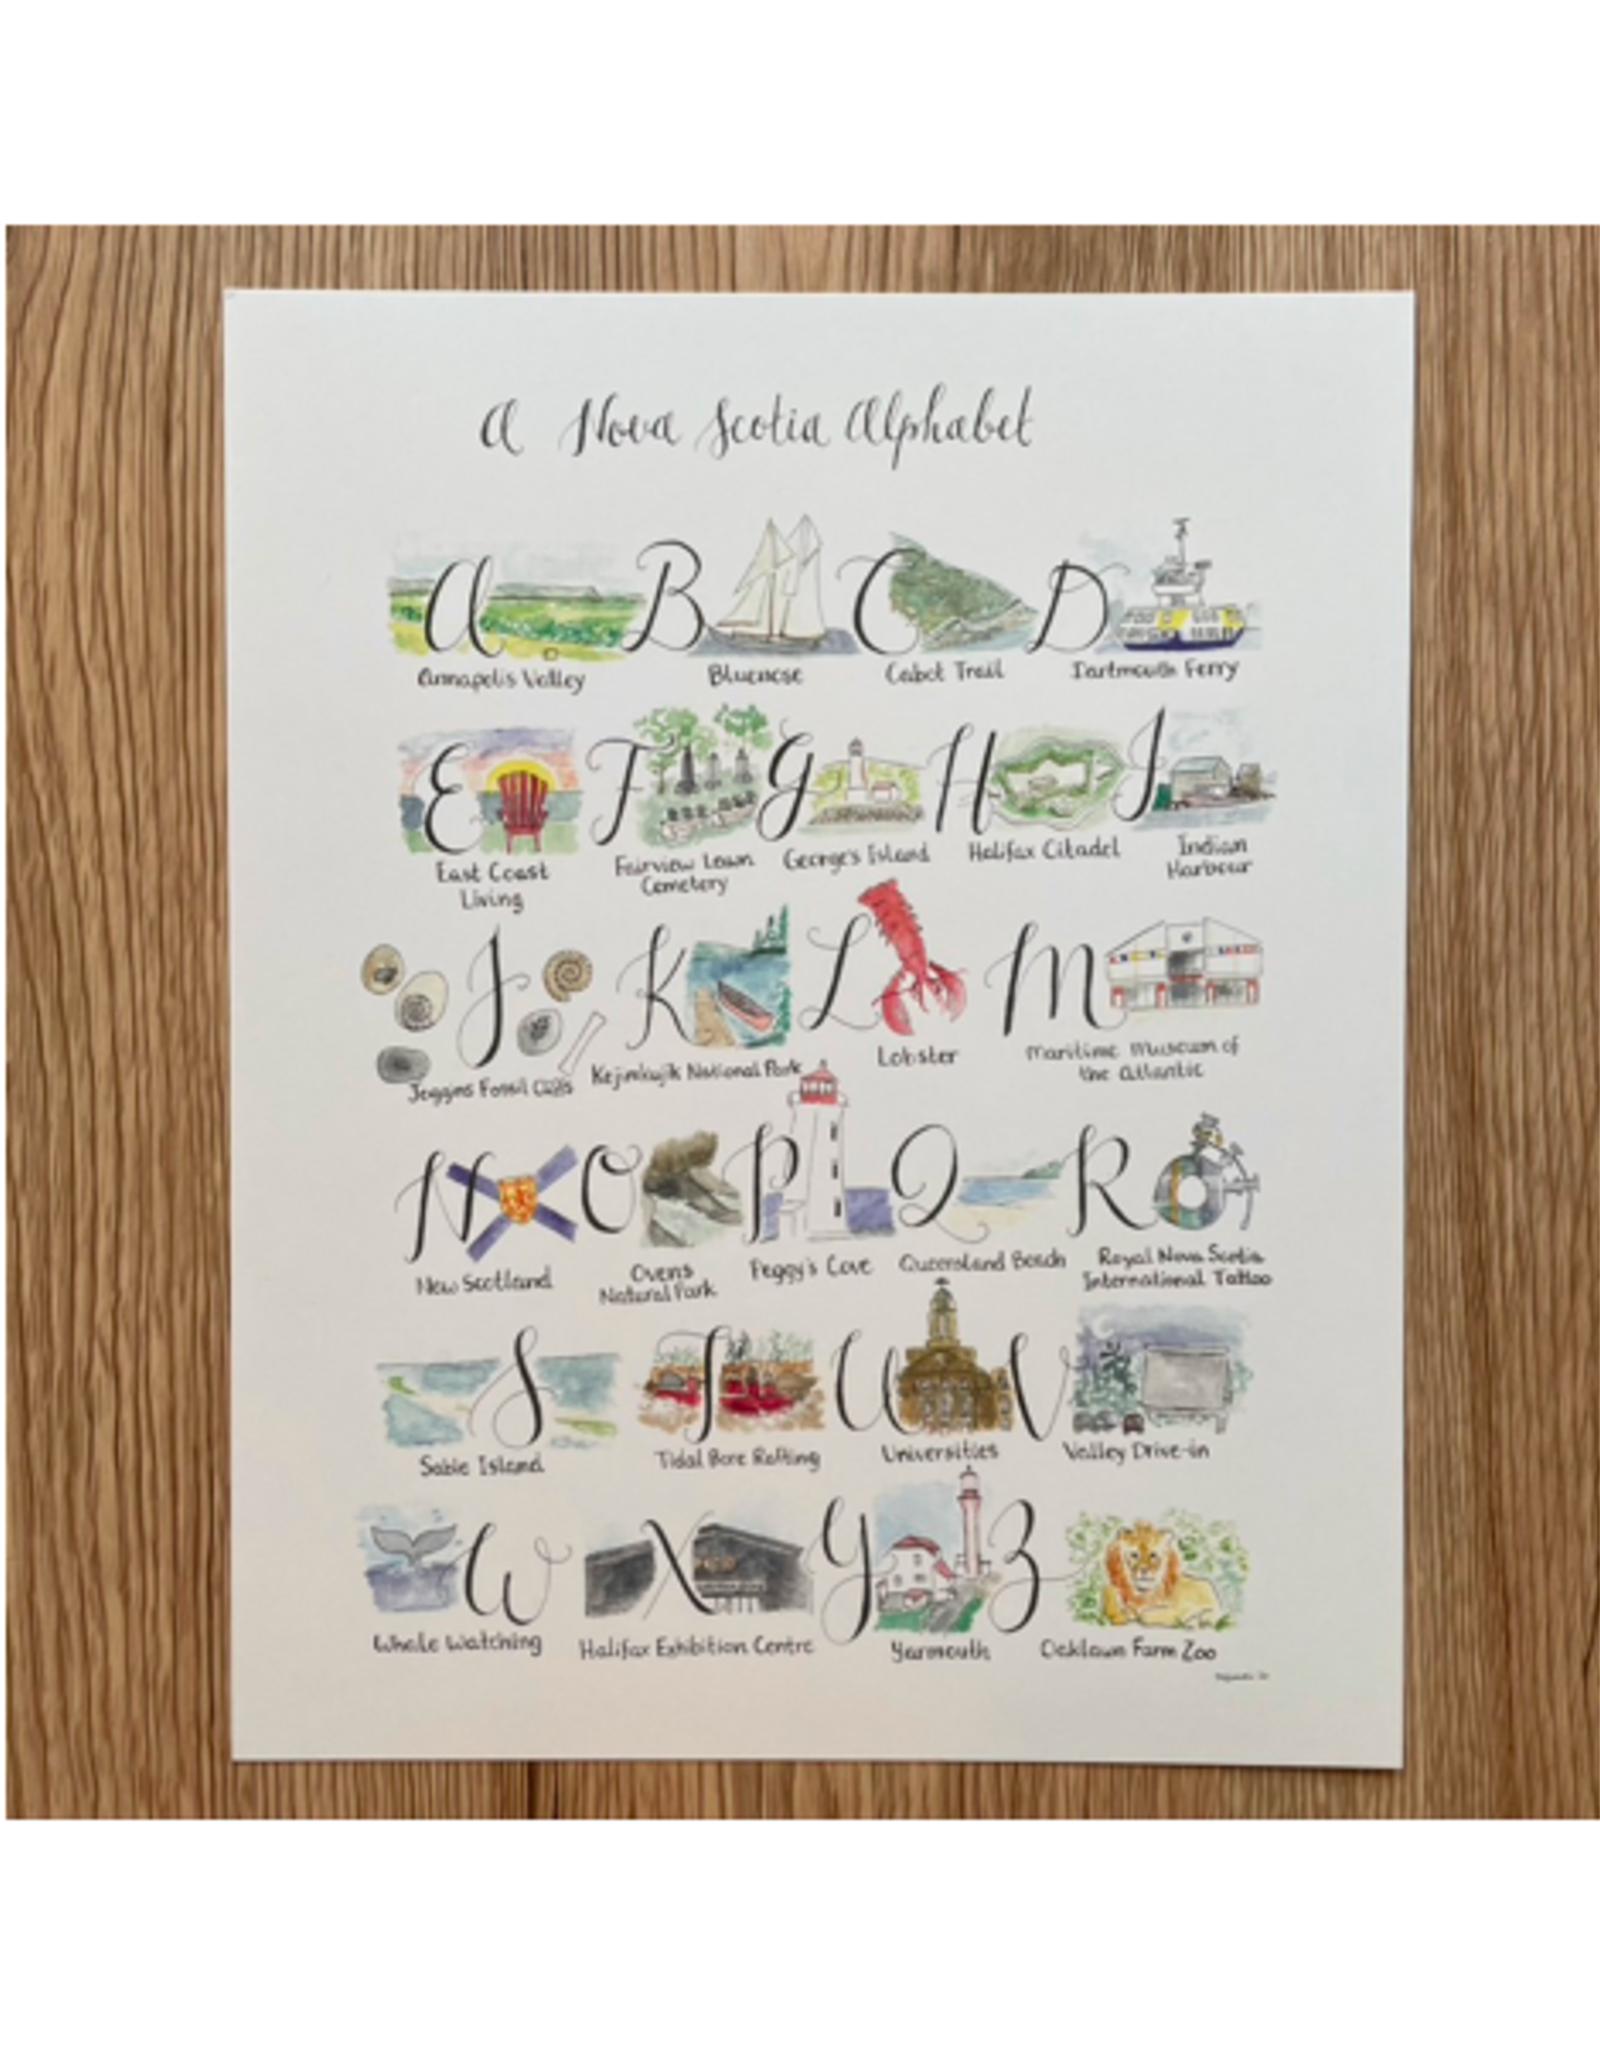 "Orchid & Ivory - Print/Nova Scotia A-Z Alphabet, 8 x 10"""